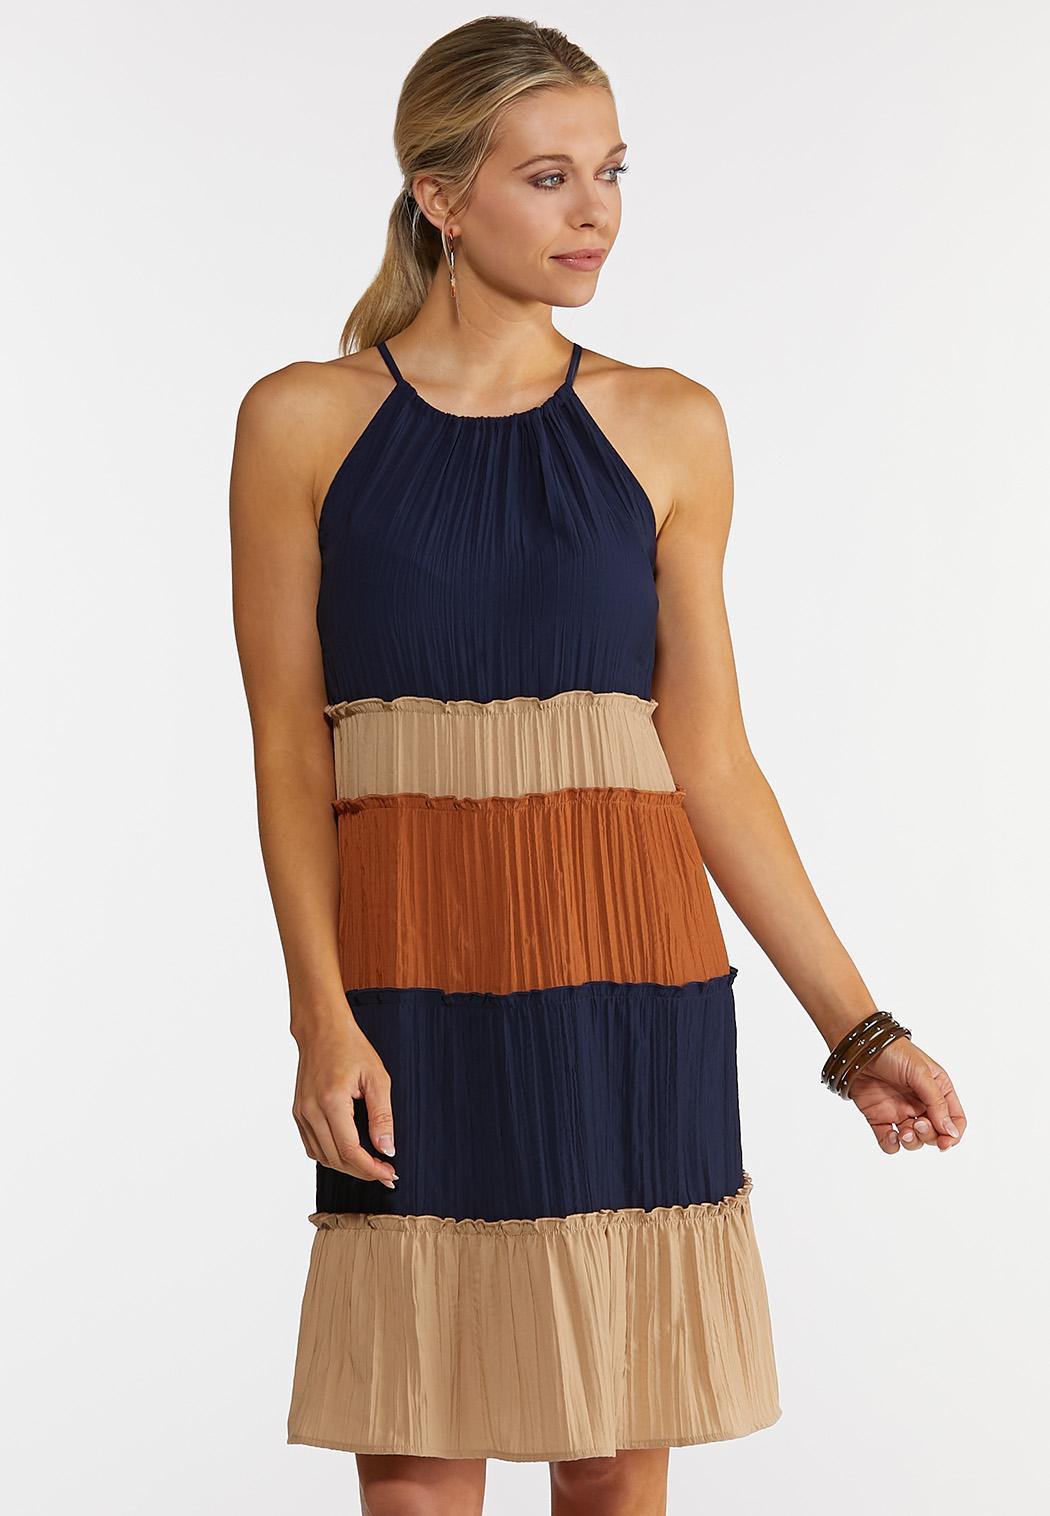 Colorblock Swing Dress